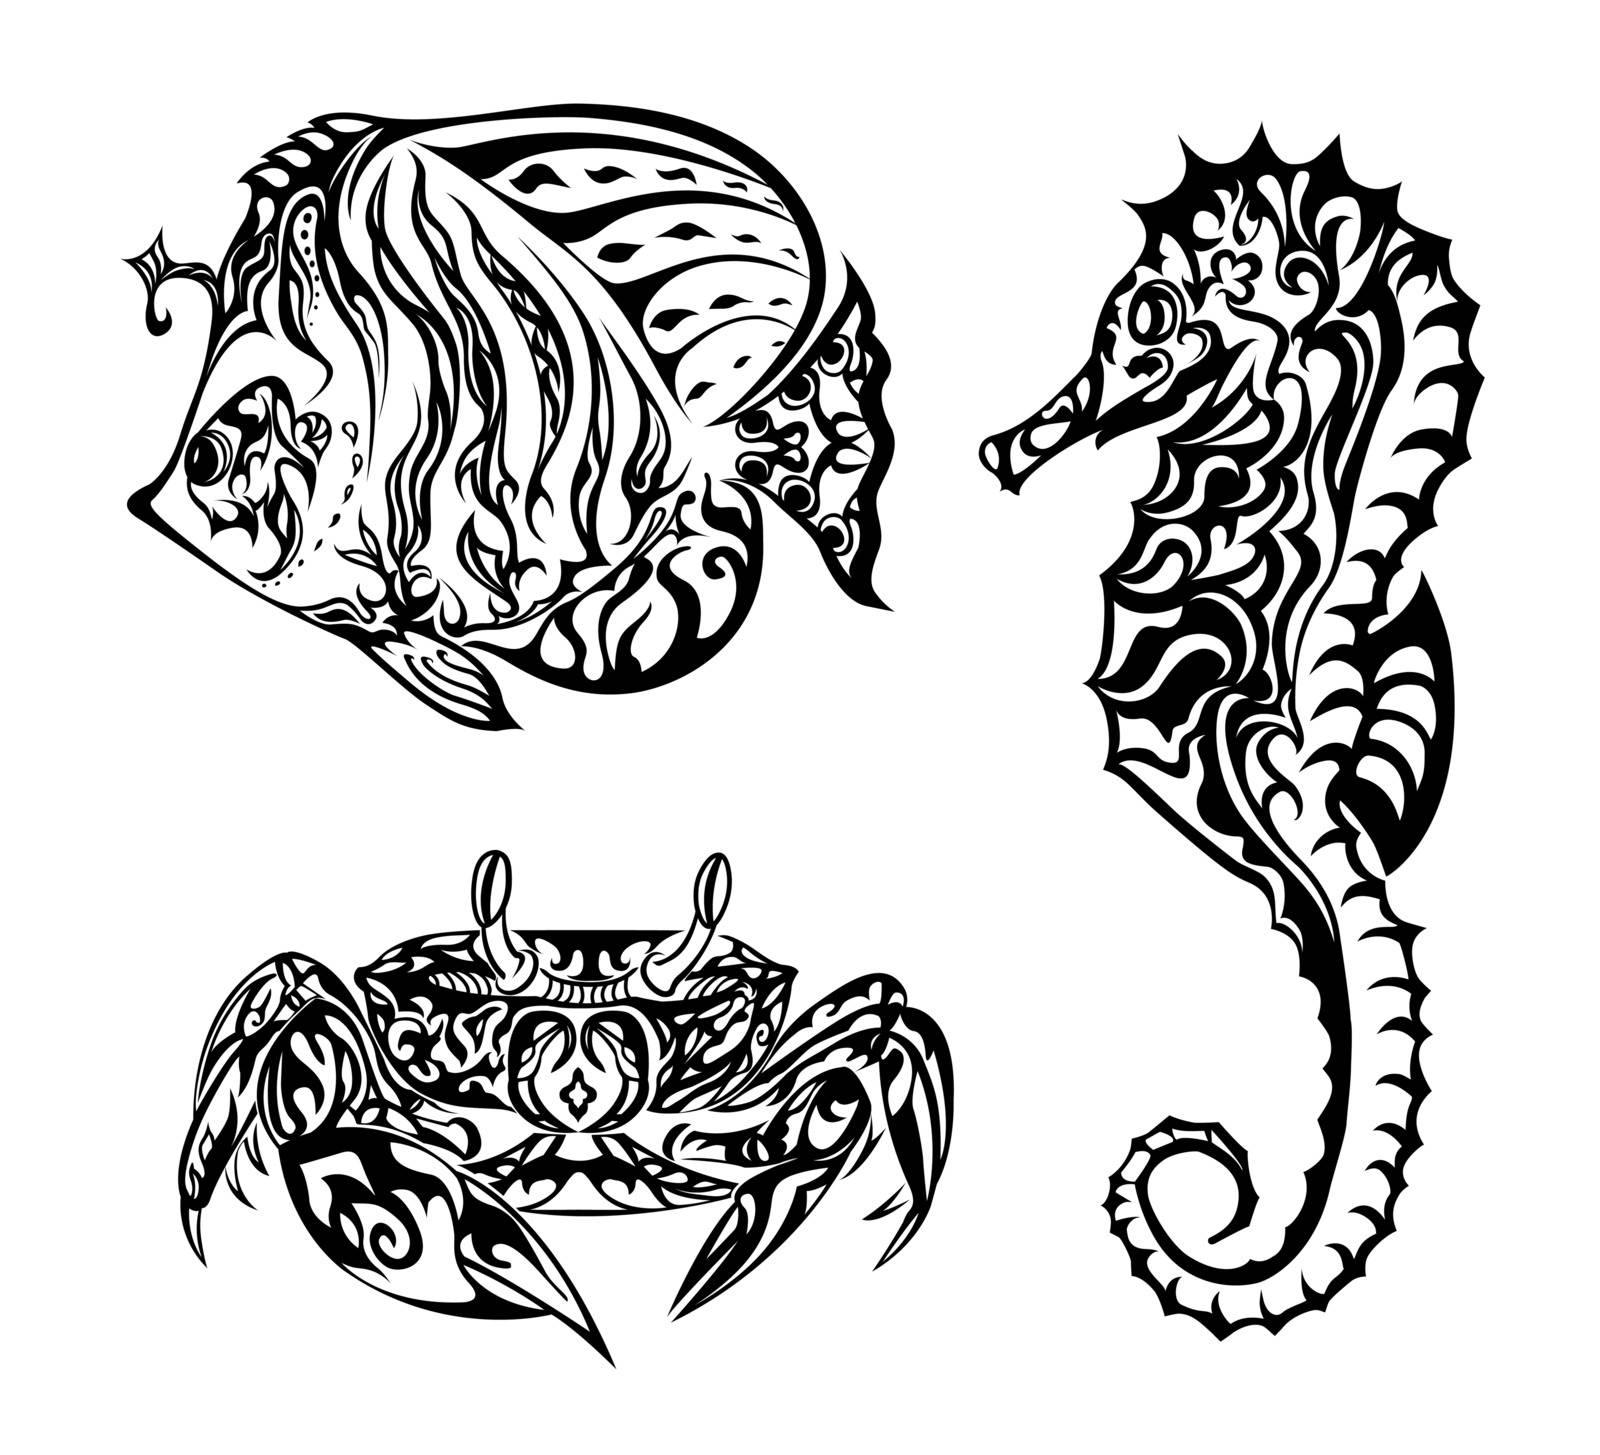 Black and white marine life based in doodling style